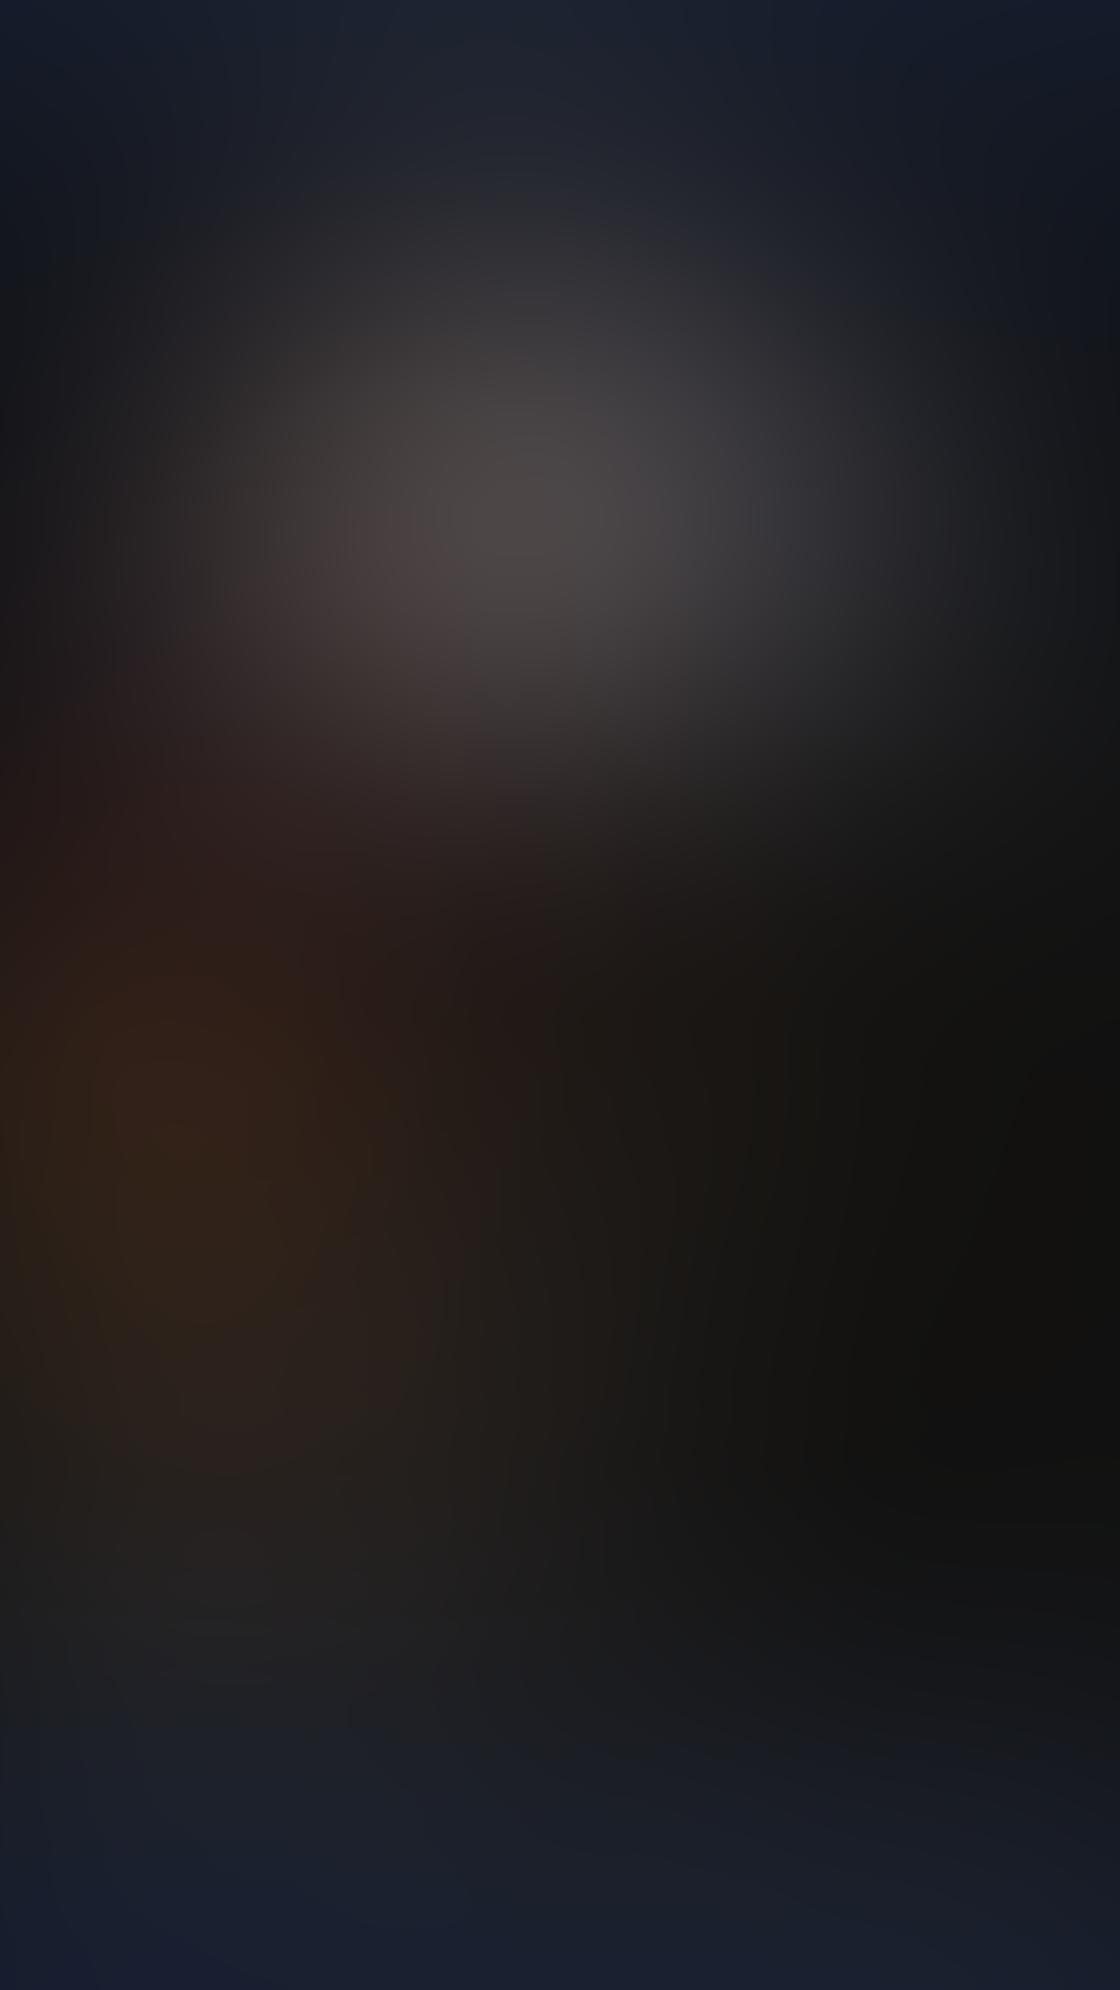 iPhone Photo Editing Workflow 35